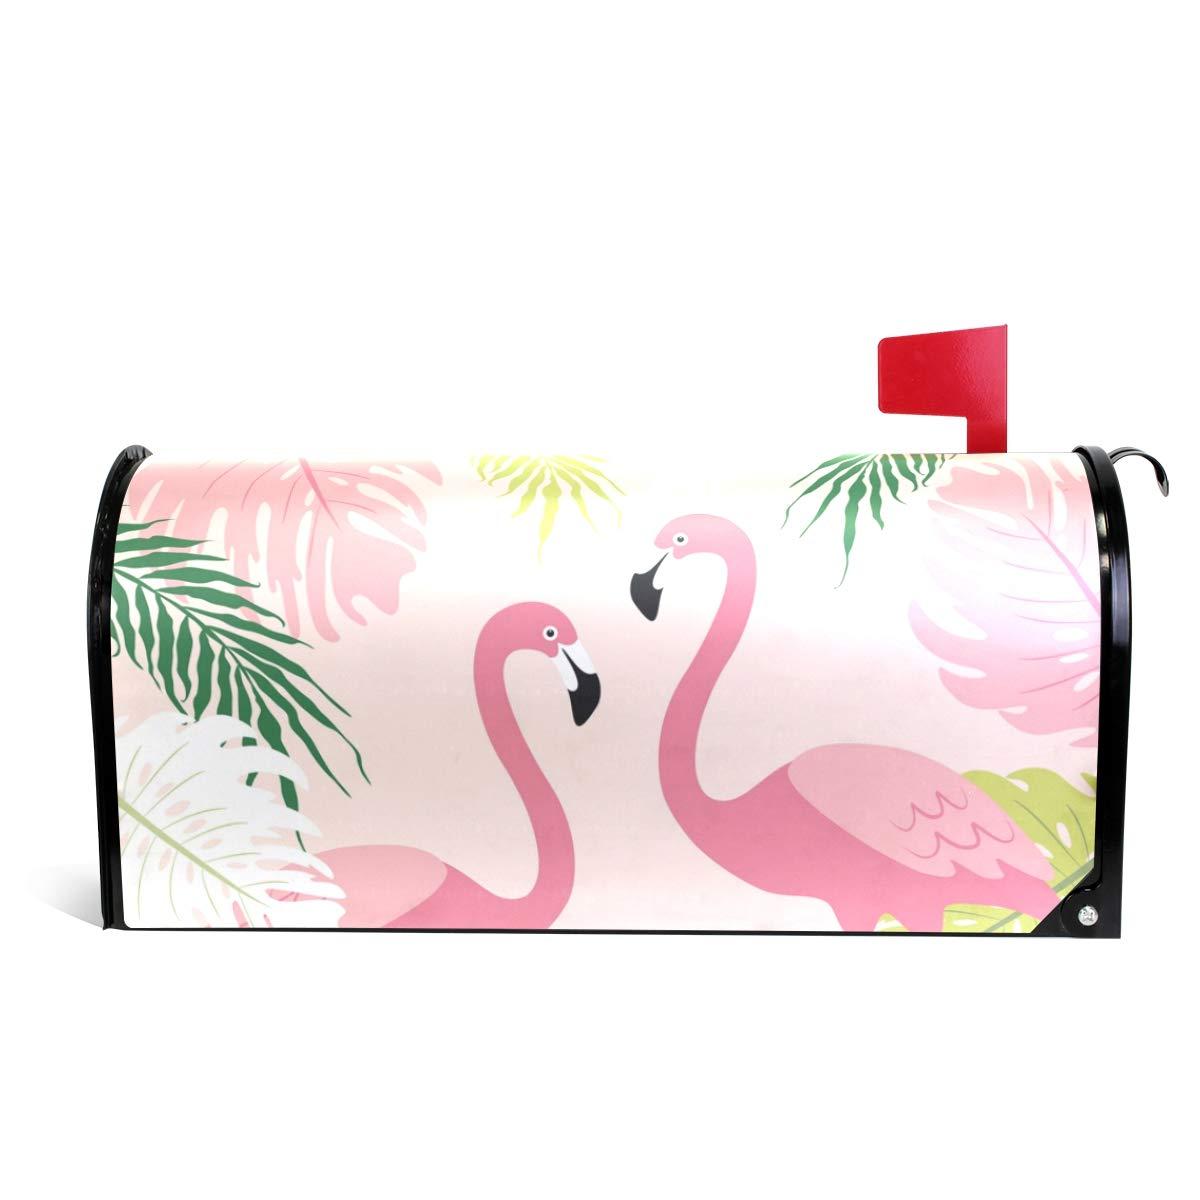 senya Home Garden Cute Tropical Flamingos Pattern Magnetic Mailbox Cover Standard by senya